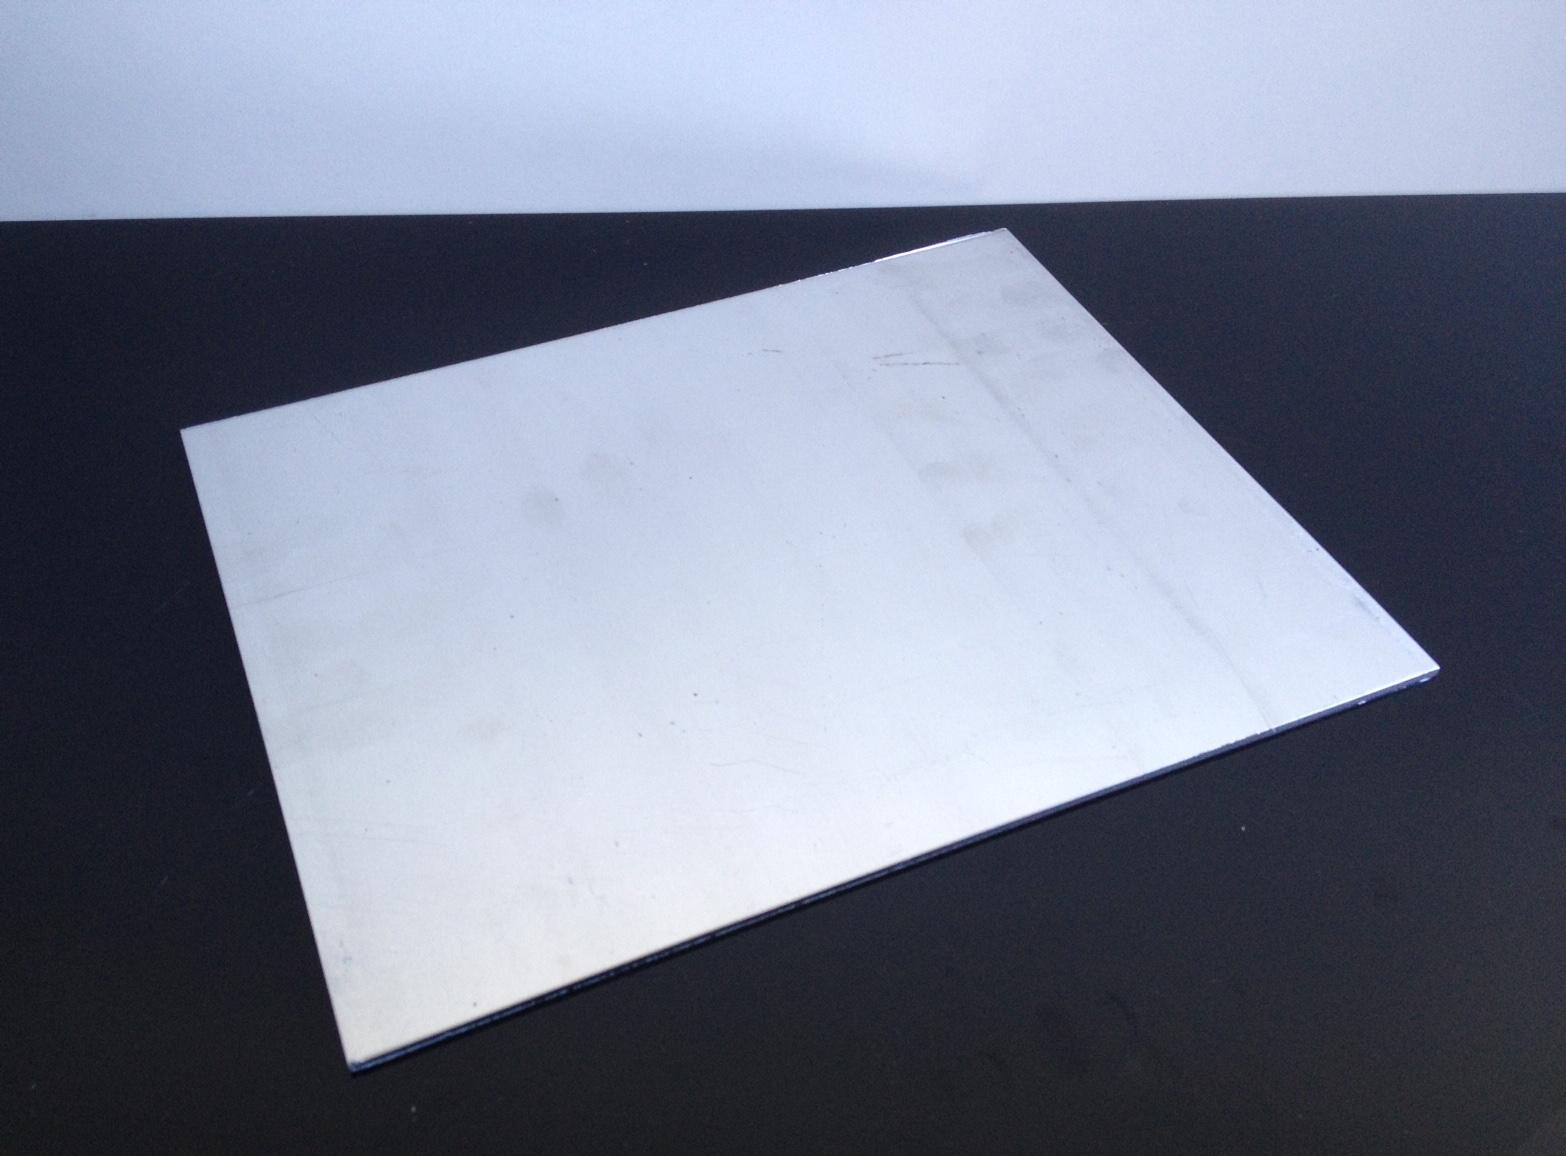 universal aluminium platte nummernschild verst rkung alloy plate 250x200x2mm 4893083151372 ebay. Black Bedroom Furniture Sets. Home Design Ideas